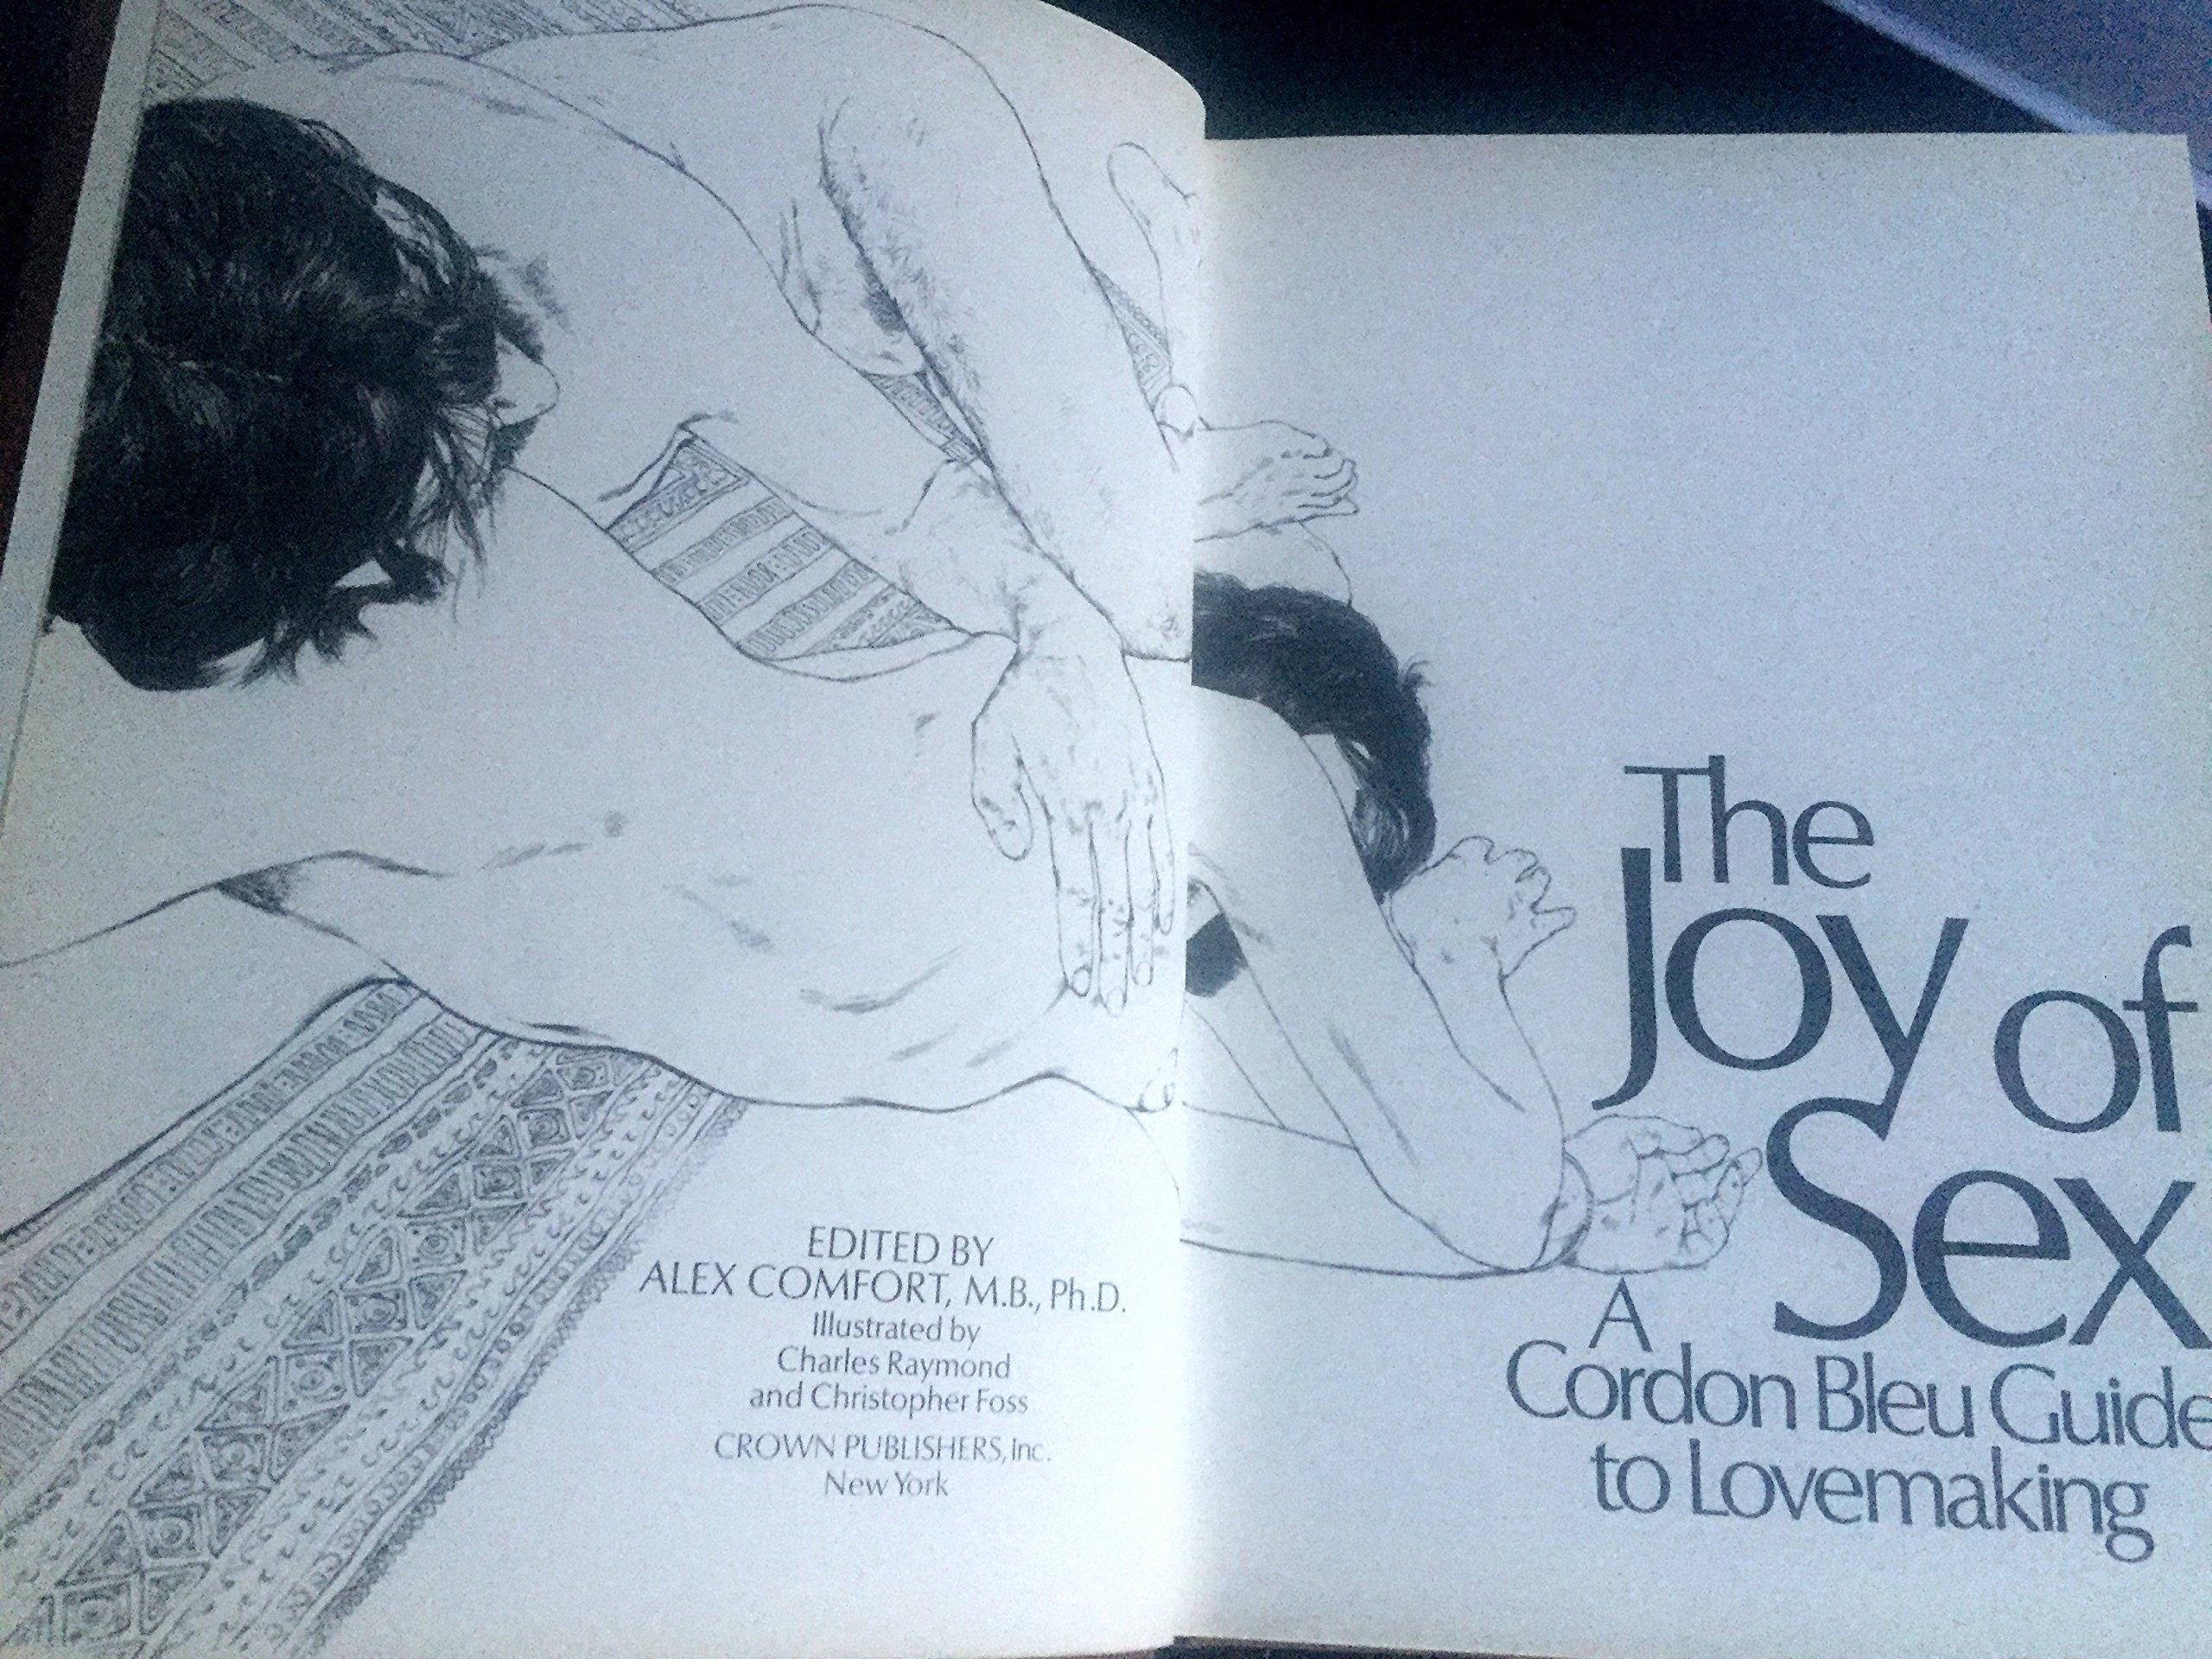 The joy of sex illustrations photo 51